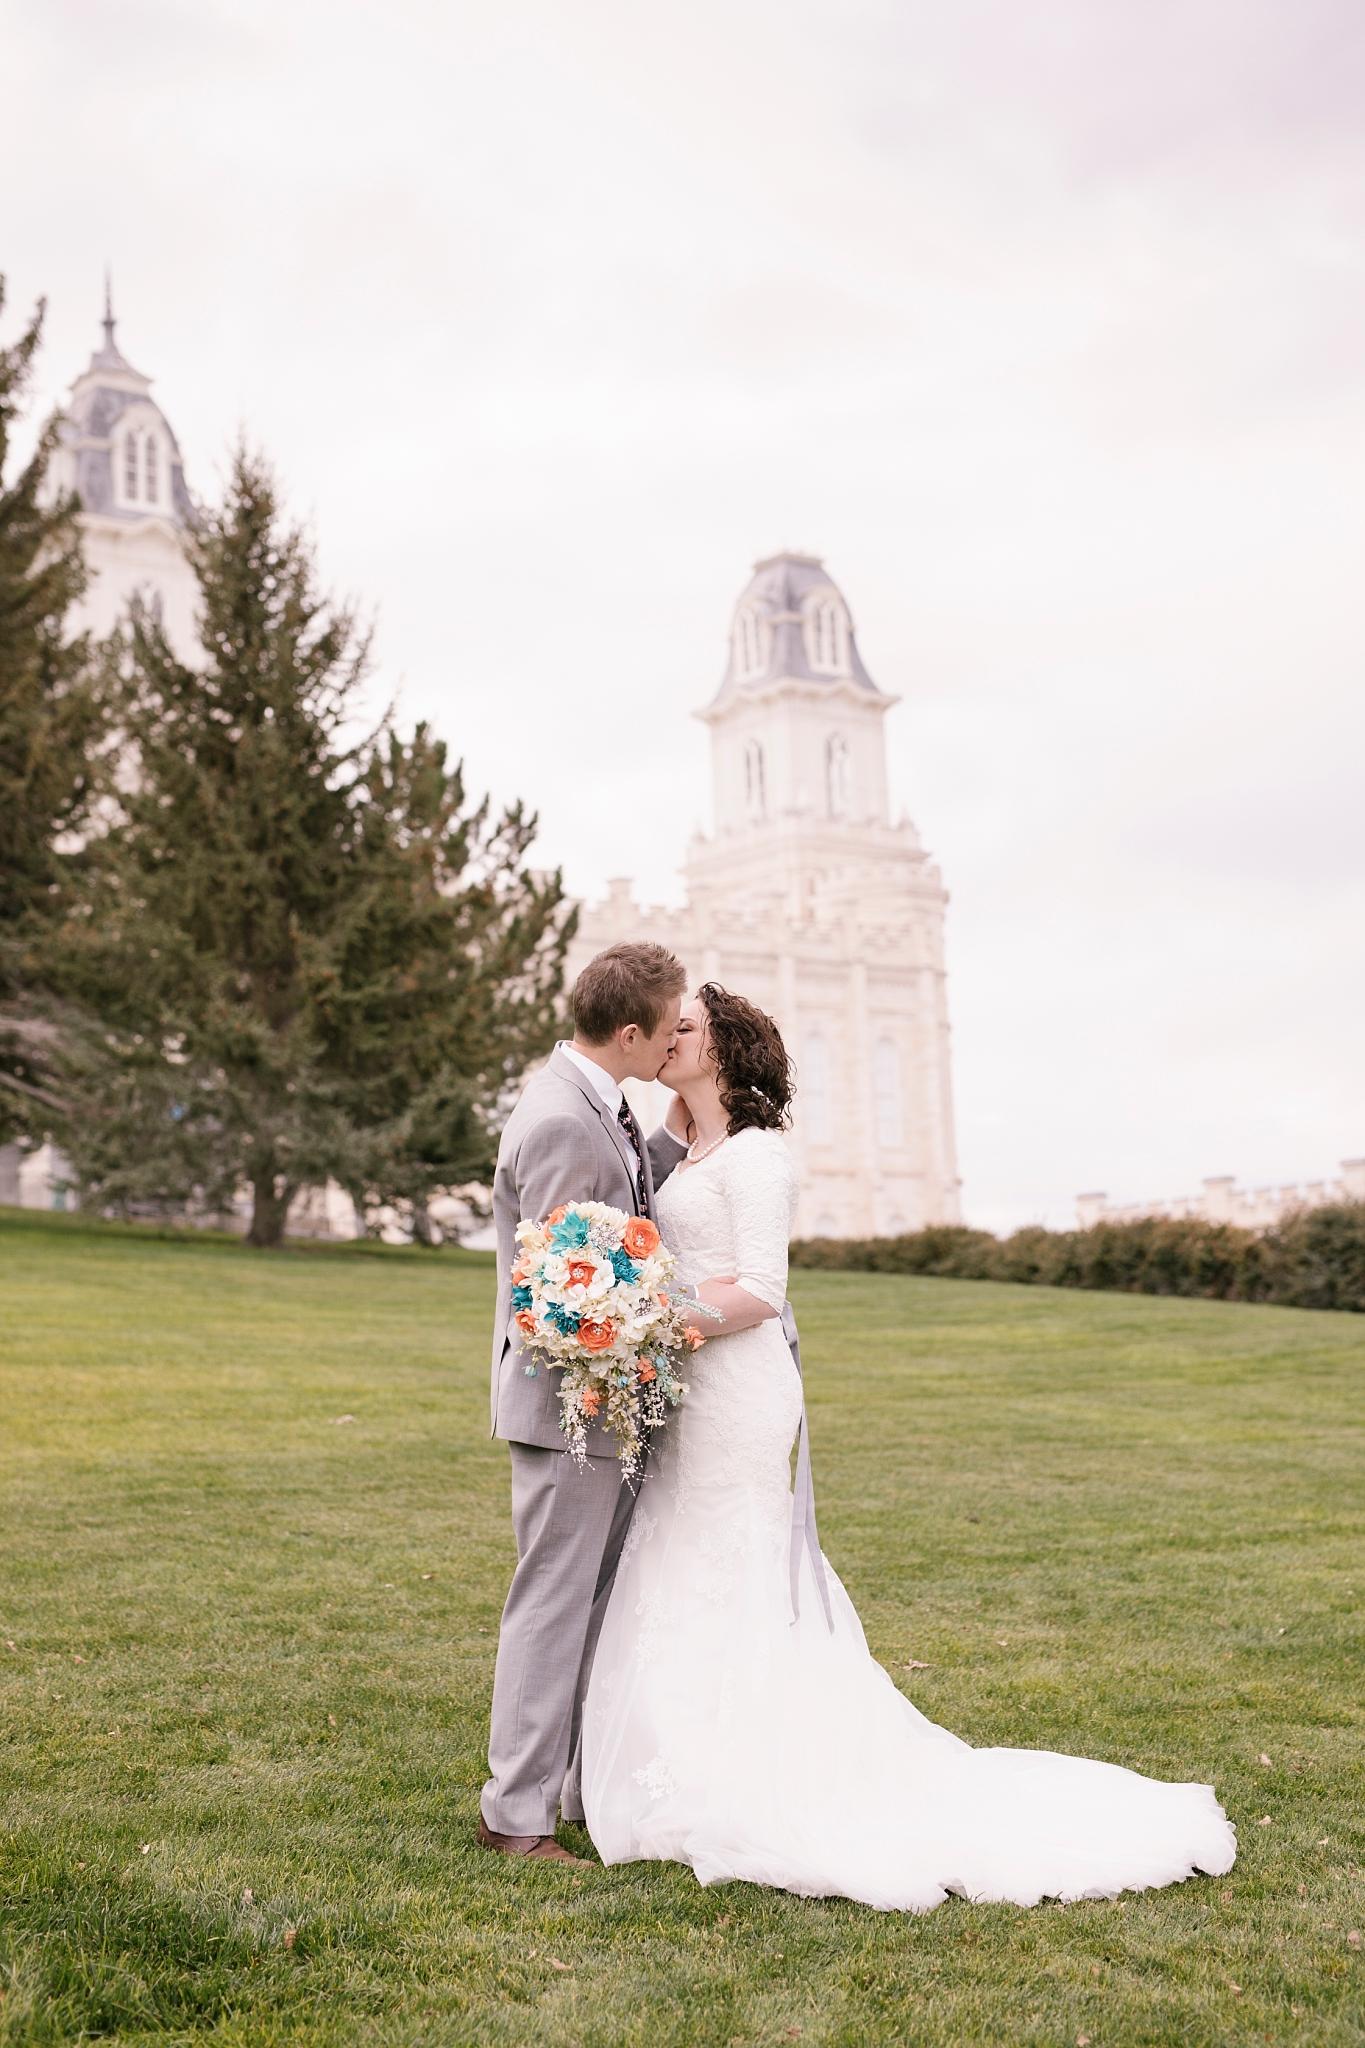 BA-Bridals-44_Lizzie-B-Imagery-Utah-Wedding-Photographer-Engagement-Photography-Salt-Lake-City-Park-City-Utah-County-Manti-Utah-Temple.jpg